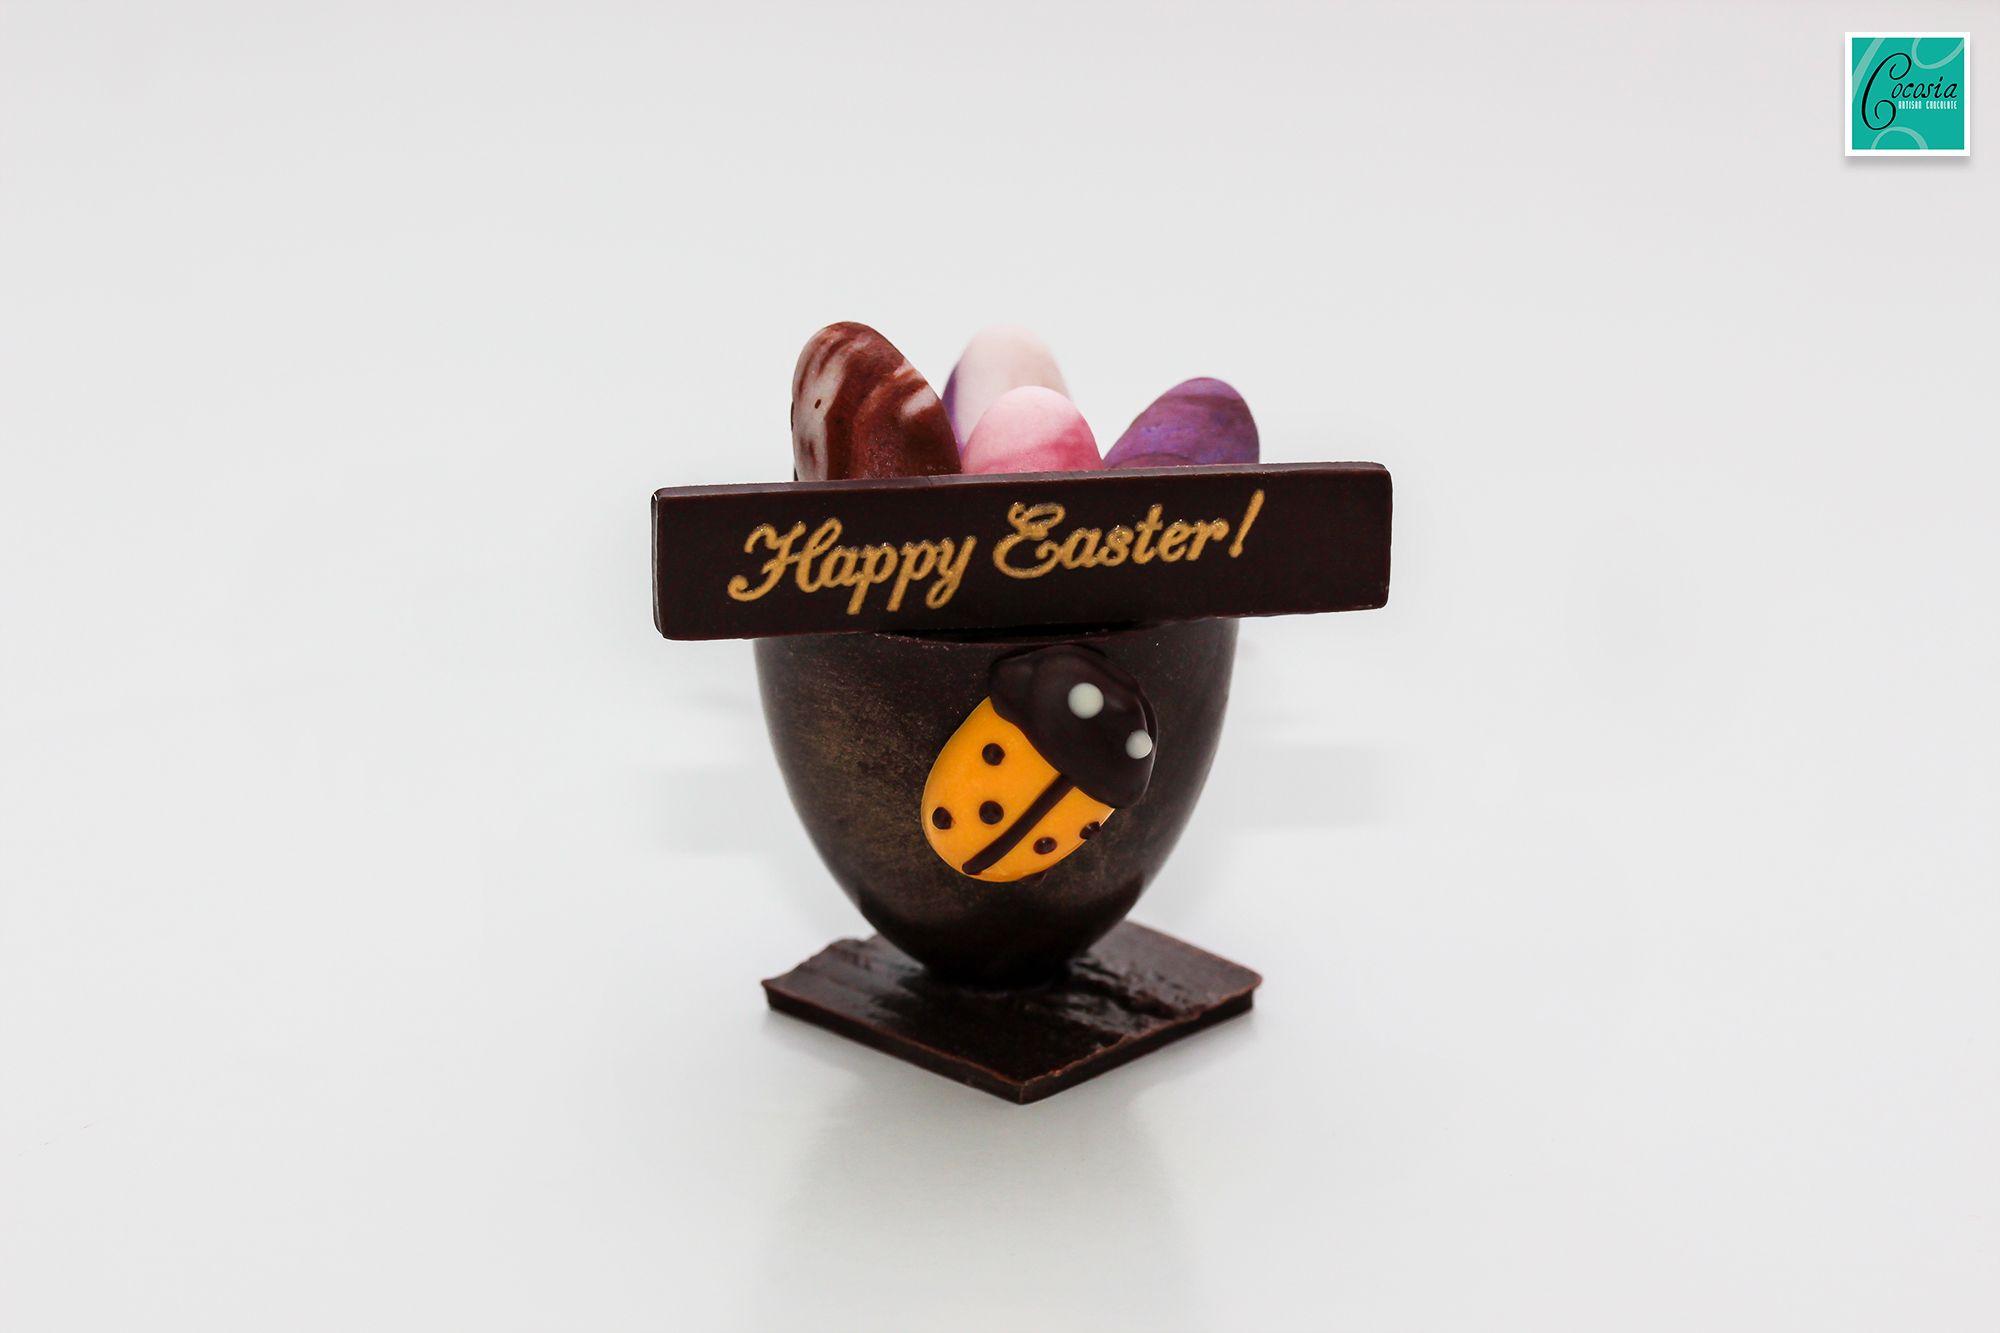 Cocosia artisan chocolate happy easter egg chocolate basket cocosia artisan chocolate happy easter egg chocolate basket negle Image collections